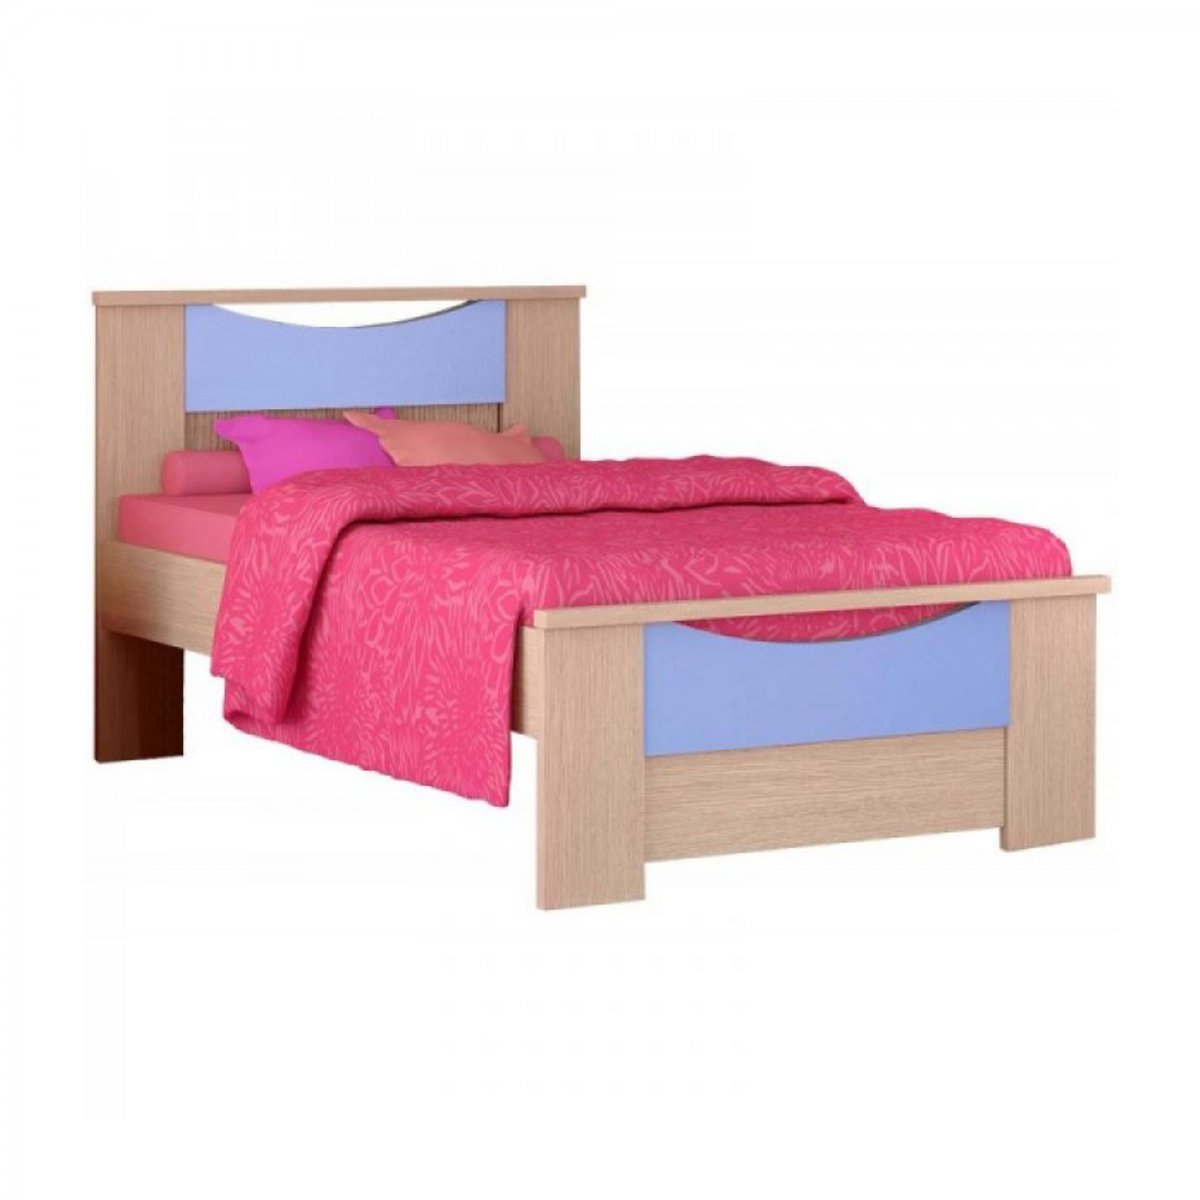 383ed96f2c4 Παιδικό κρεβάτι